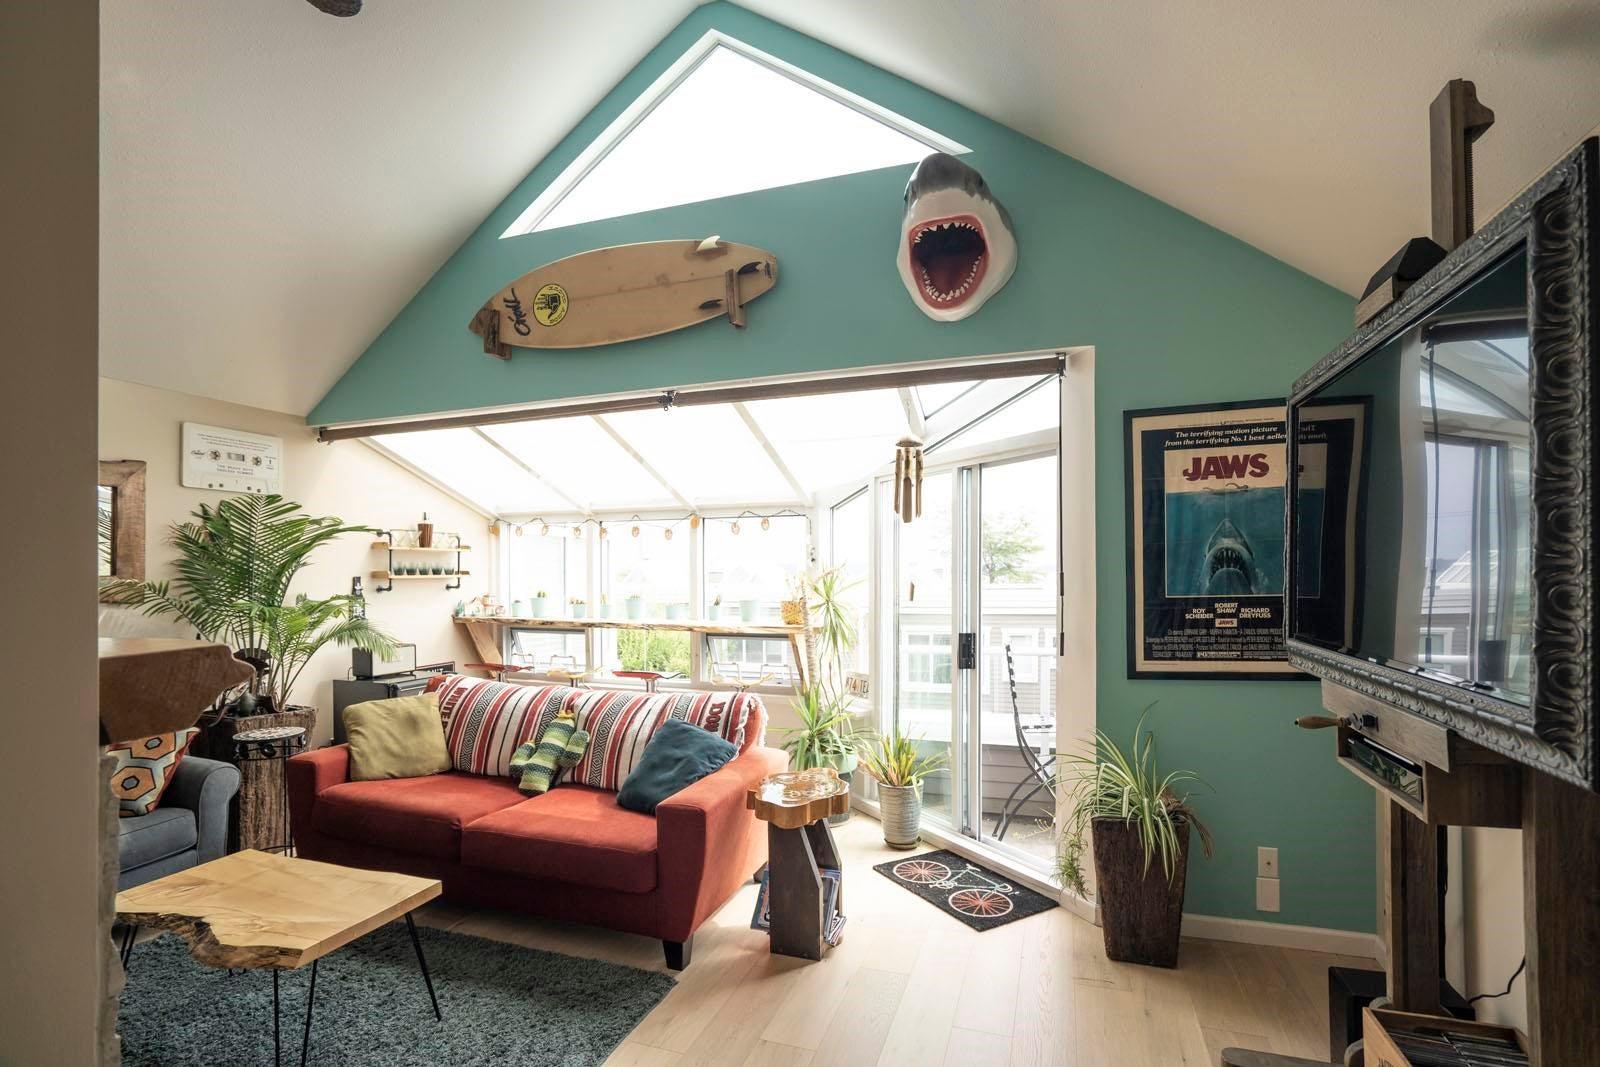 14832 BEACHVIEW AVENUE - White Rock Townhouse for sale, 2 Bedrooms (R2606829)